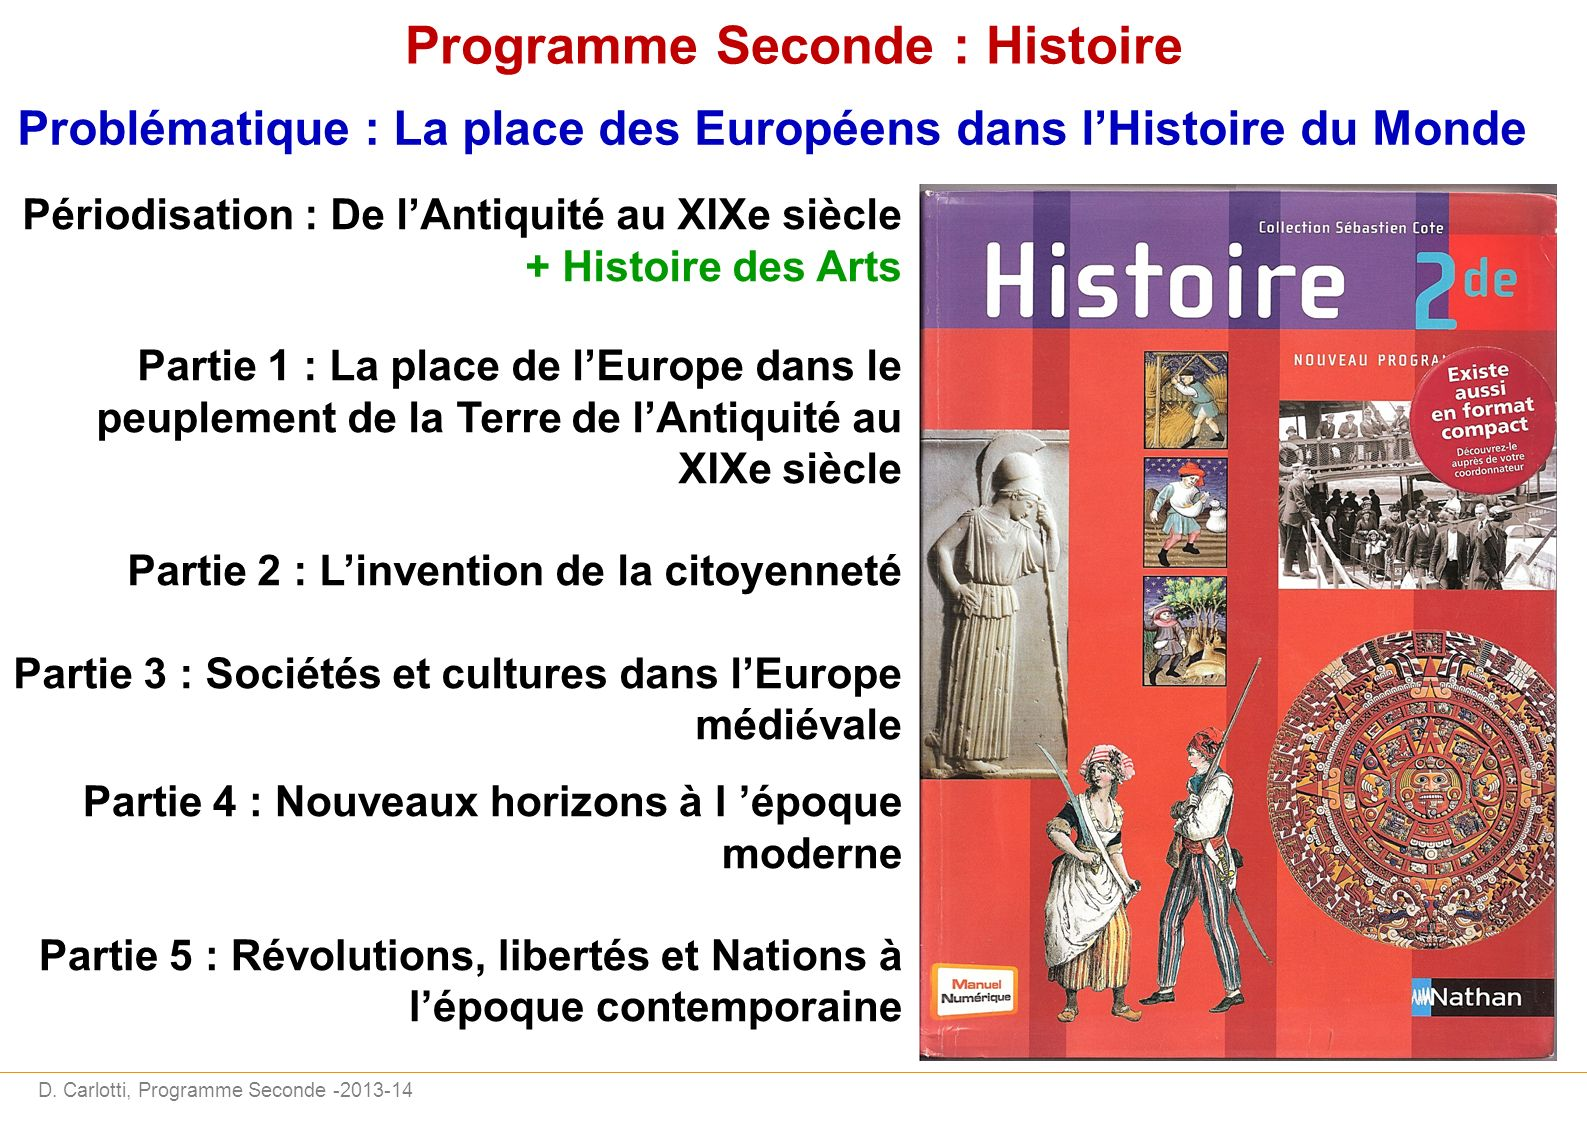 Programme Seconde : Histoire